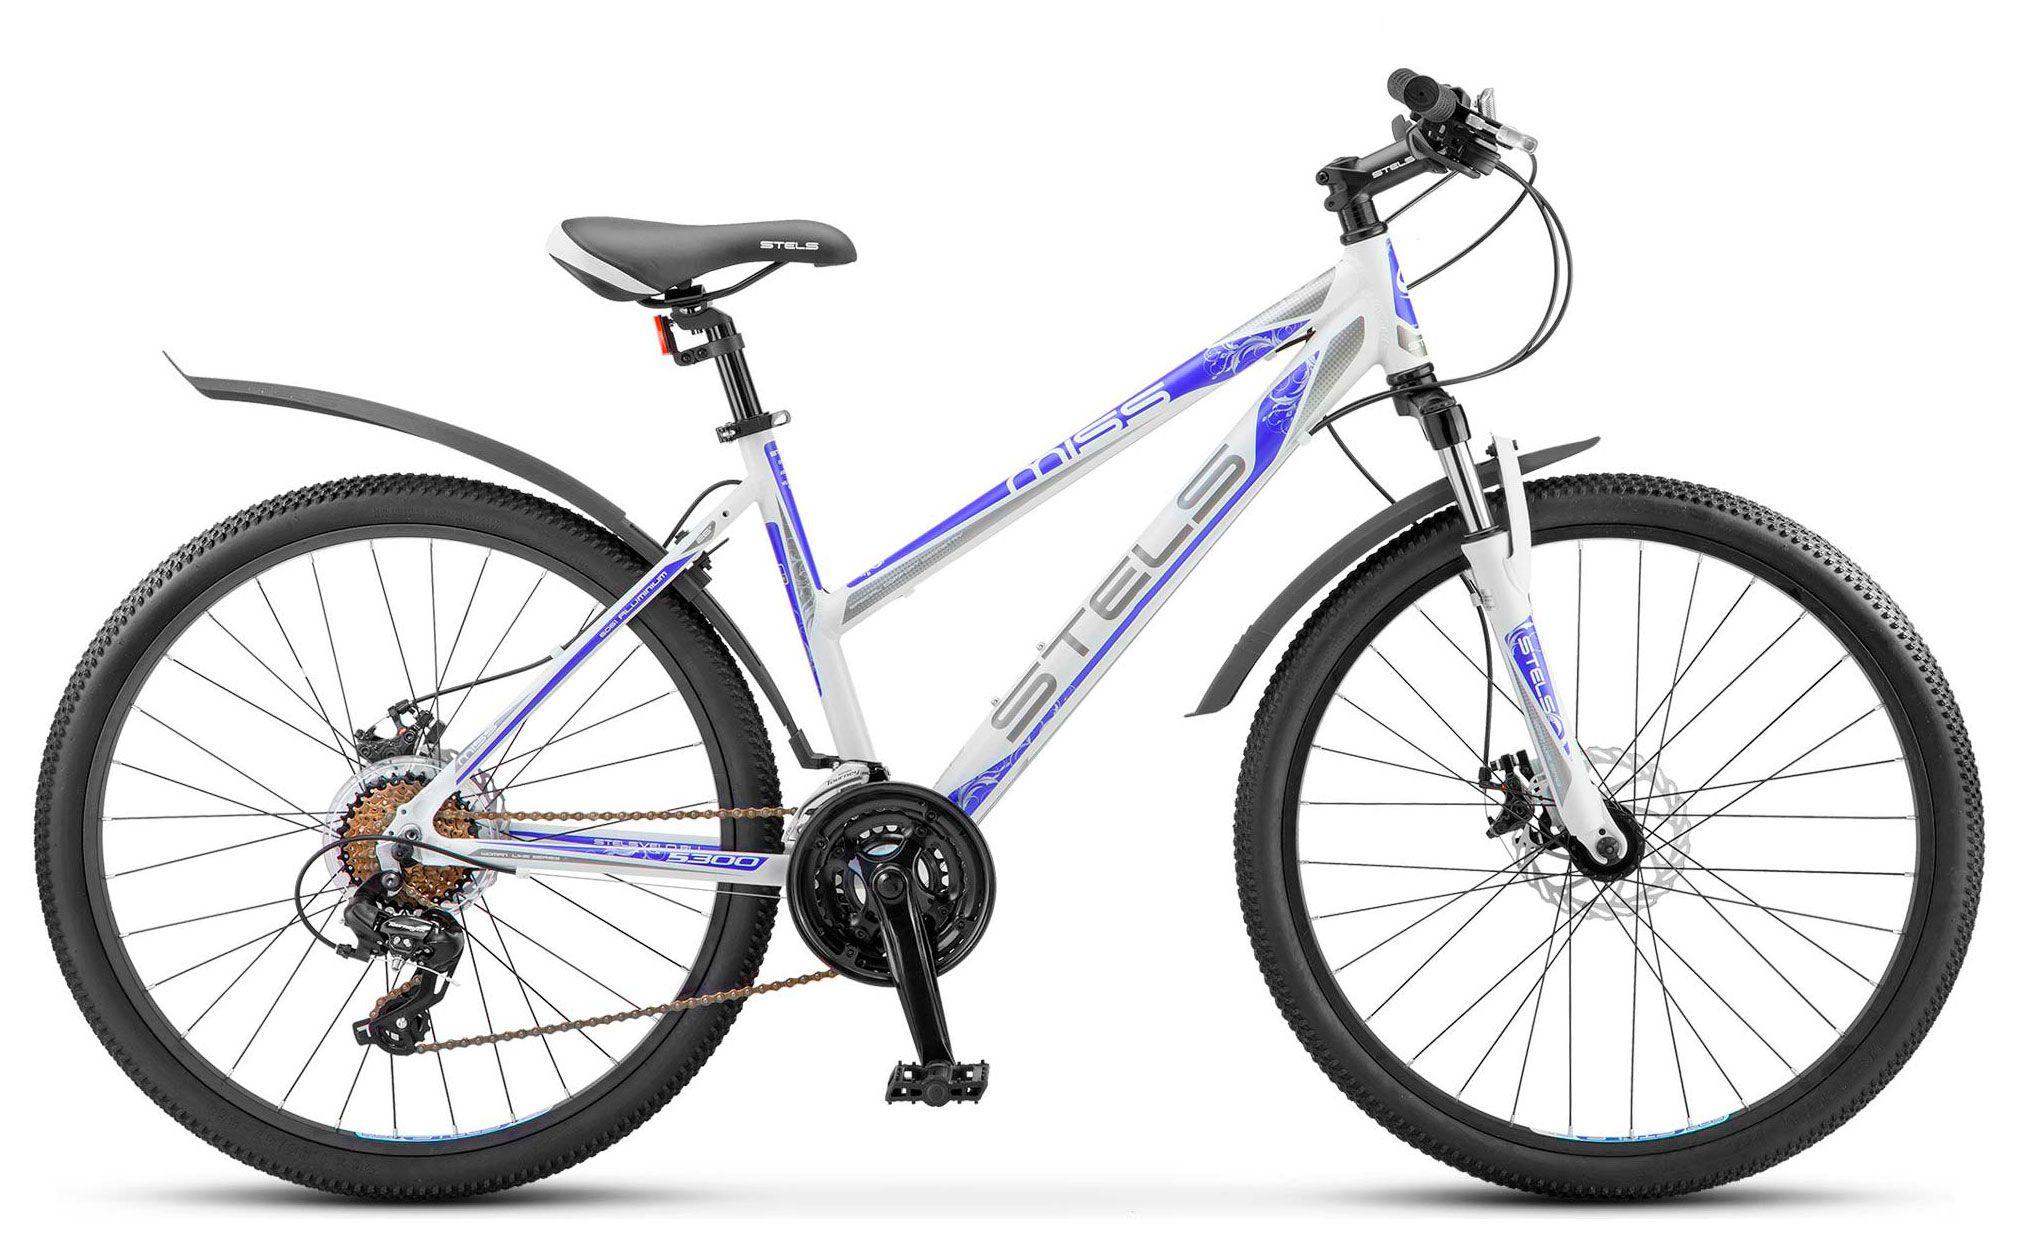 Велосипед Stels Miss 5300 MD 26 (V030) 2018 велосипед stels miss 6100 md 26 2017